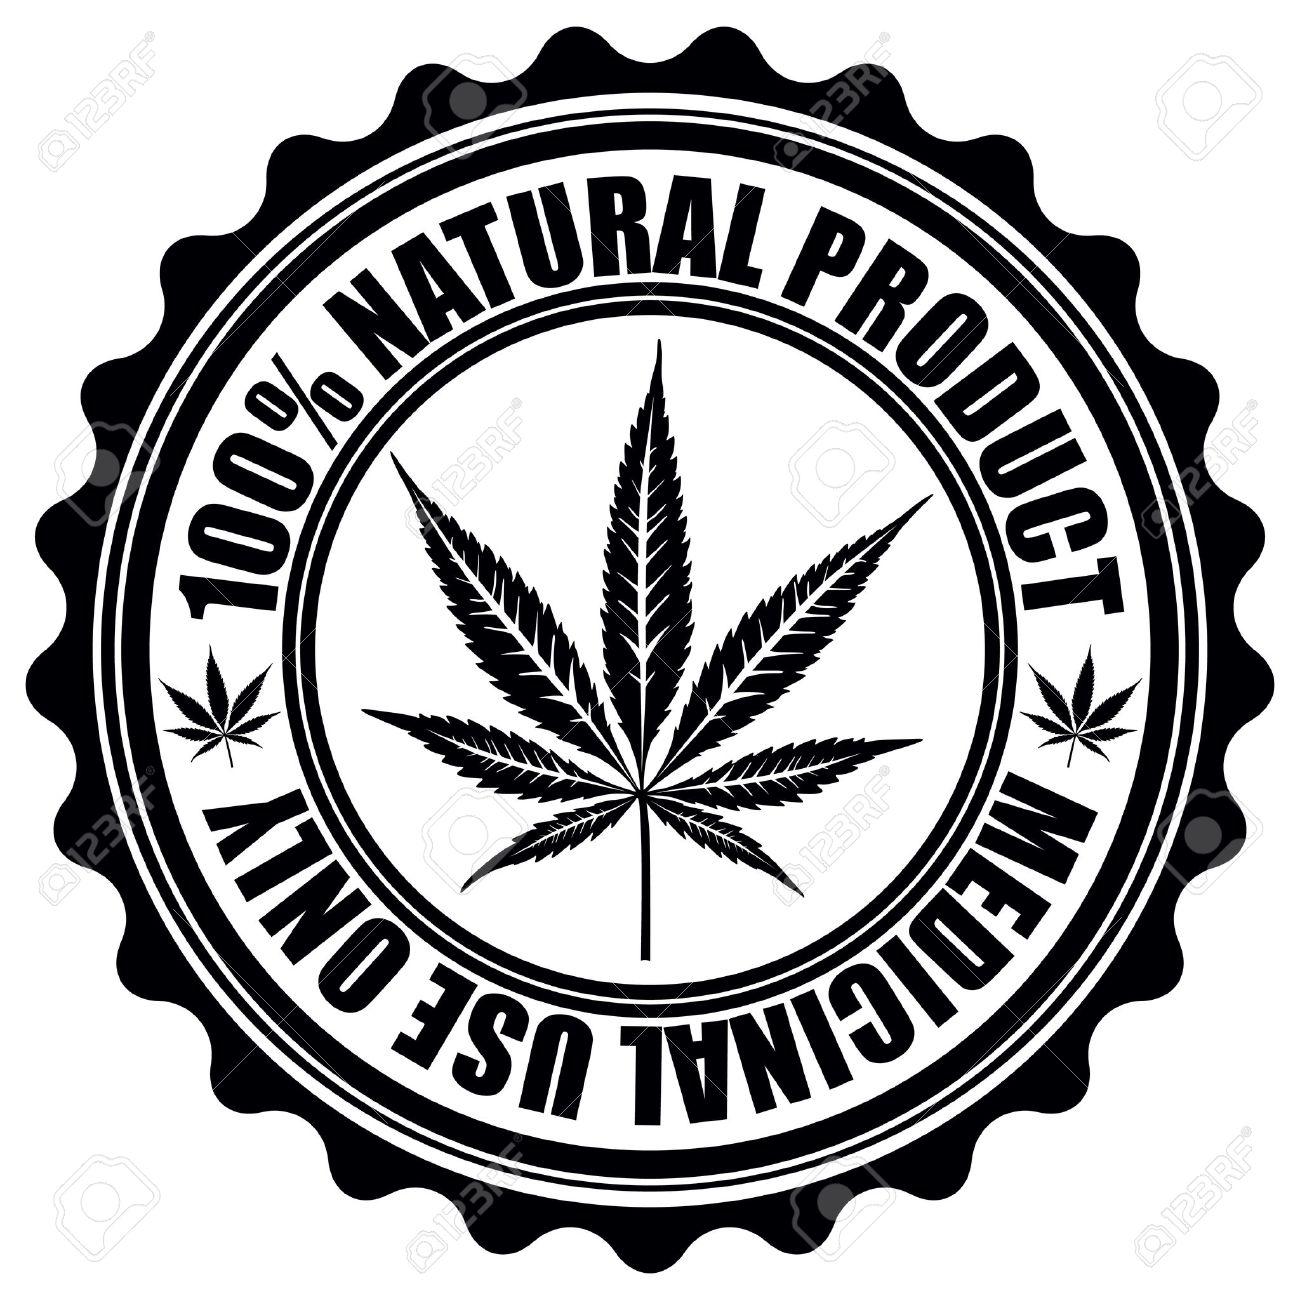 Stamp with marijuana leaf emblem. Cannabis leaf silhouette symbol. Vector illustration - 29266402